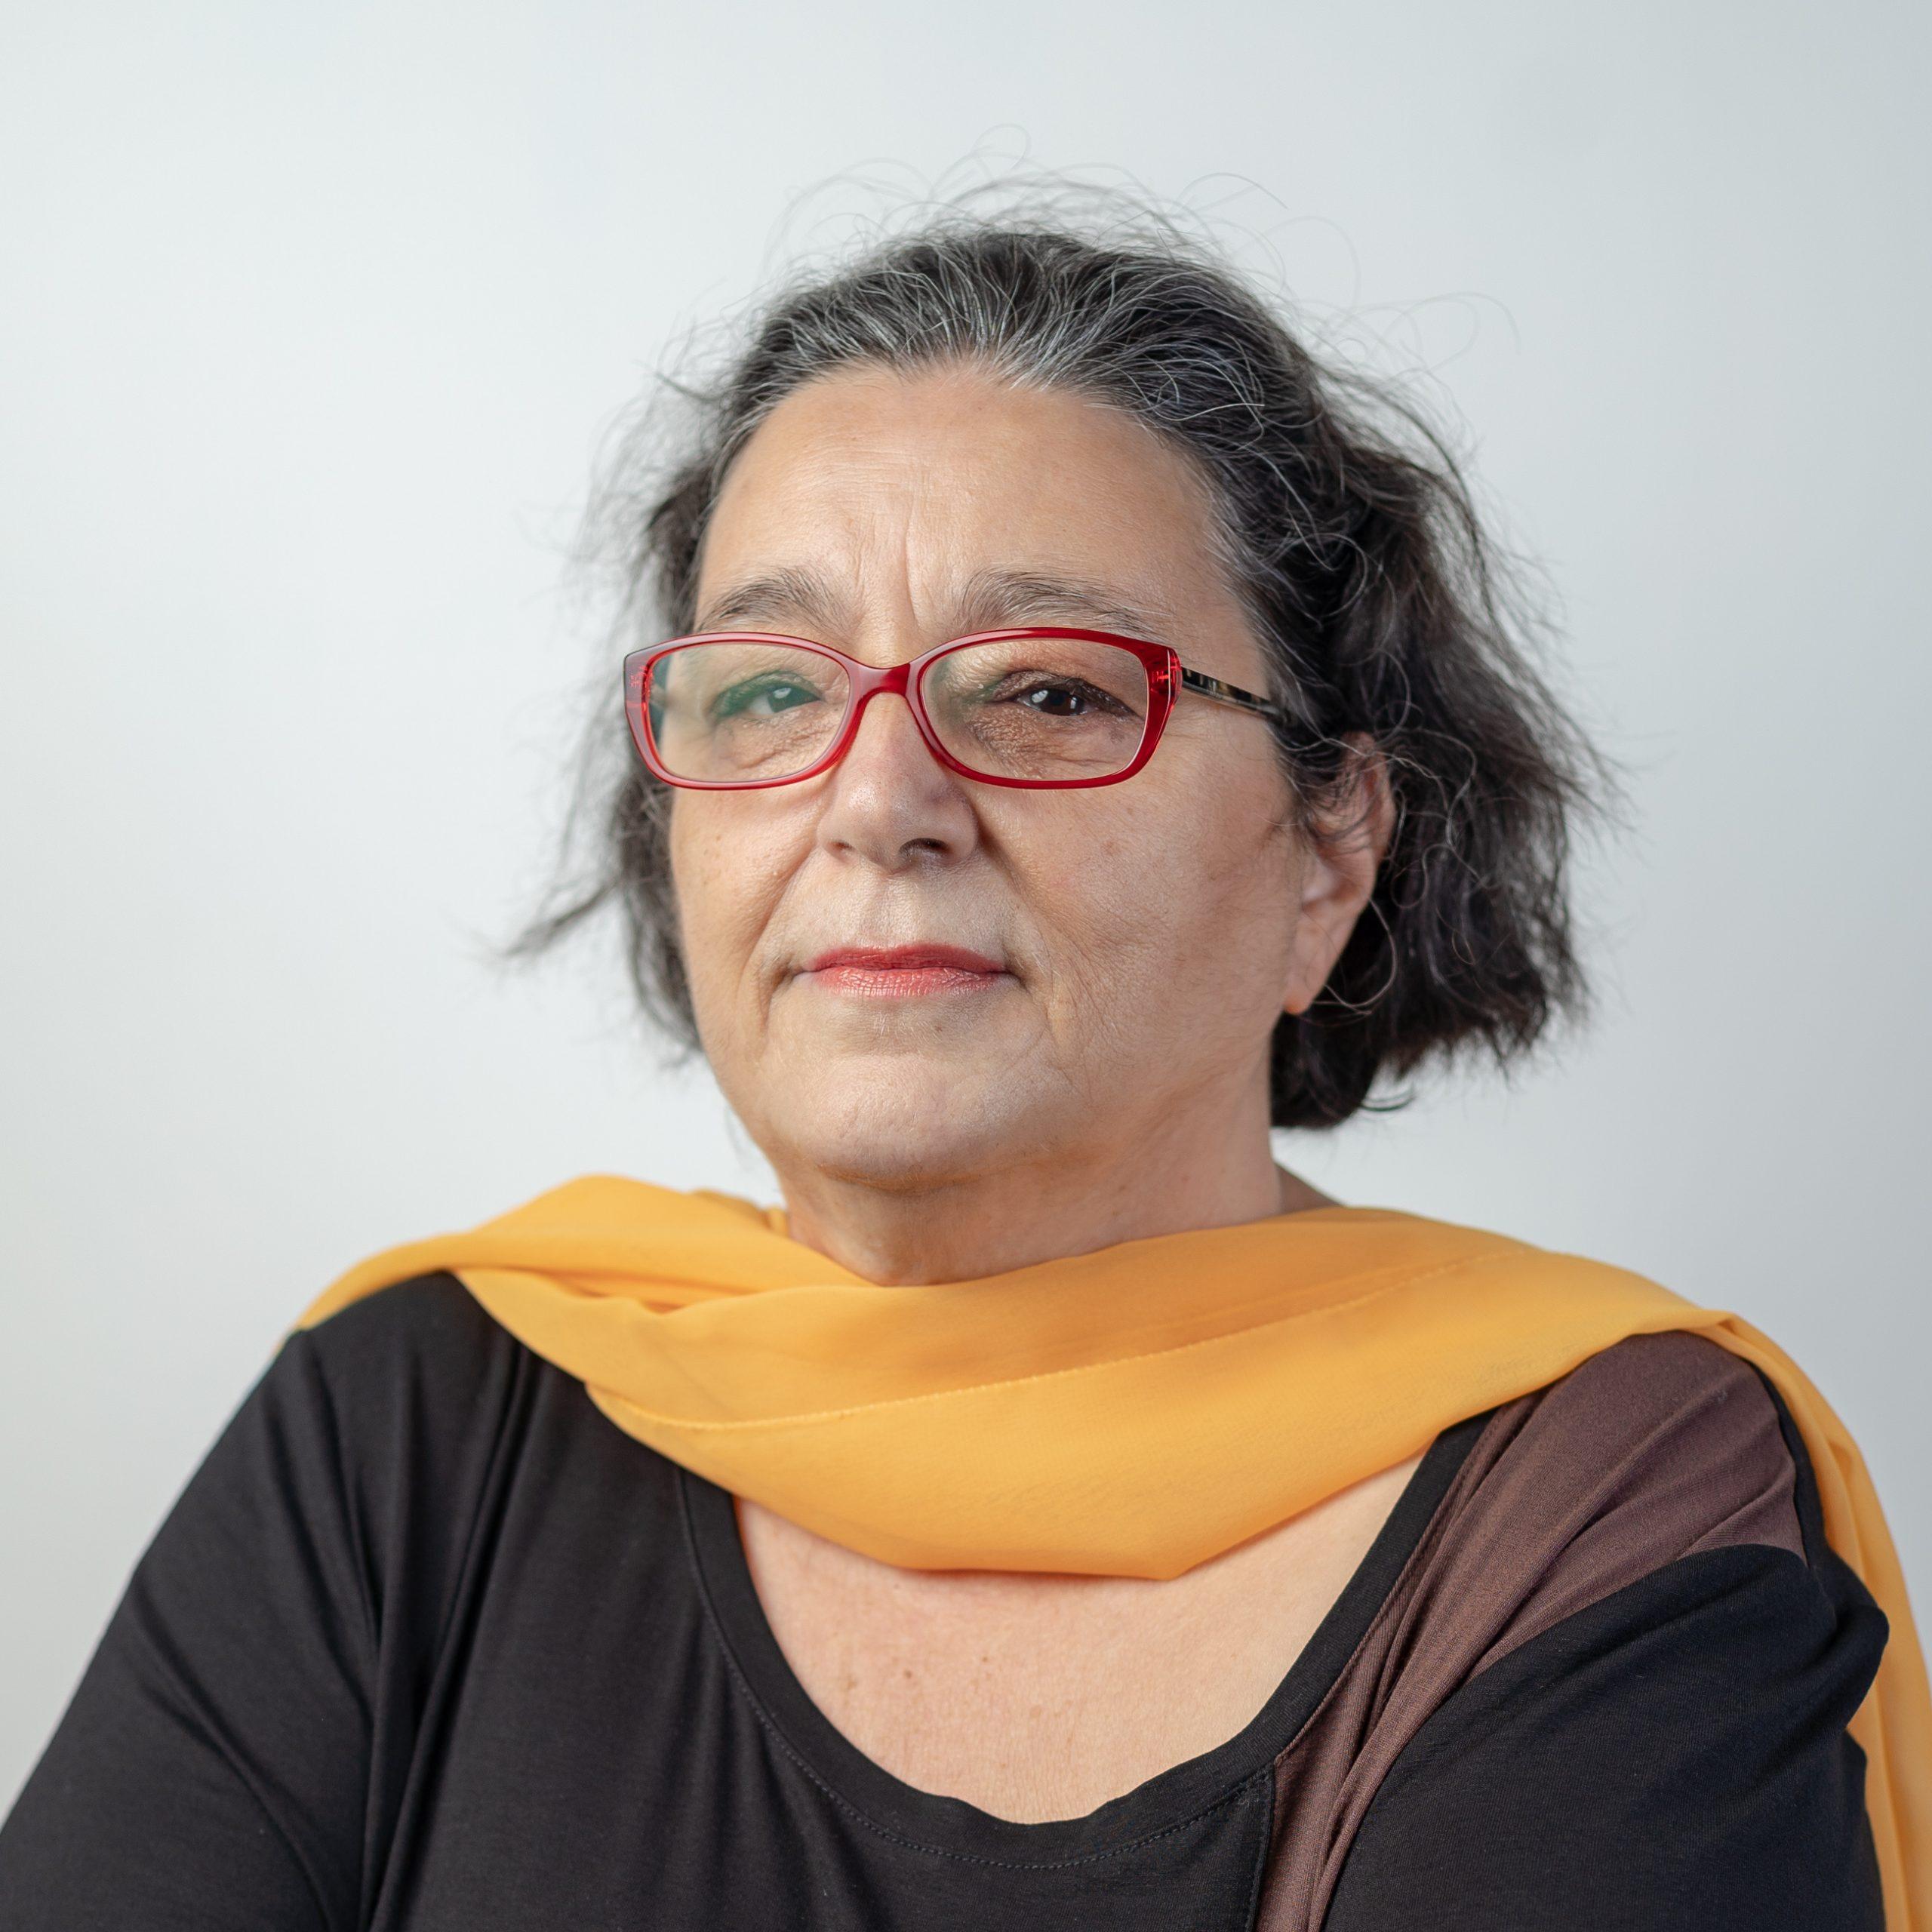 Emanuela Petitti